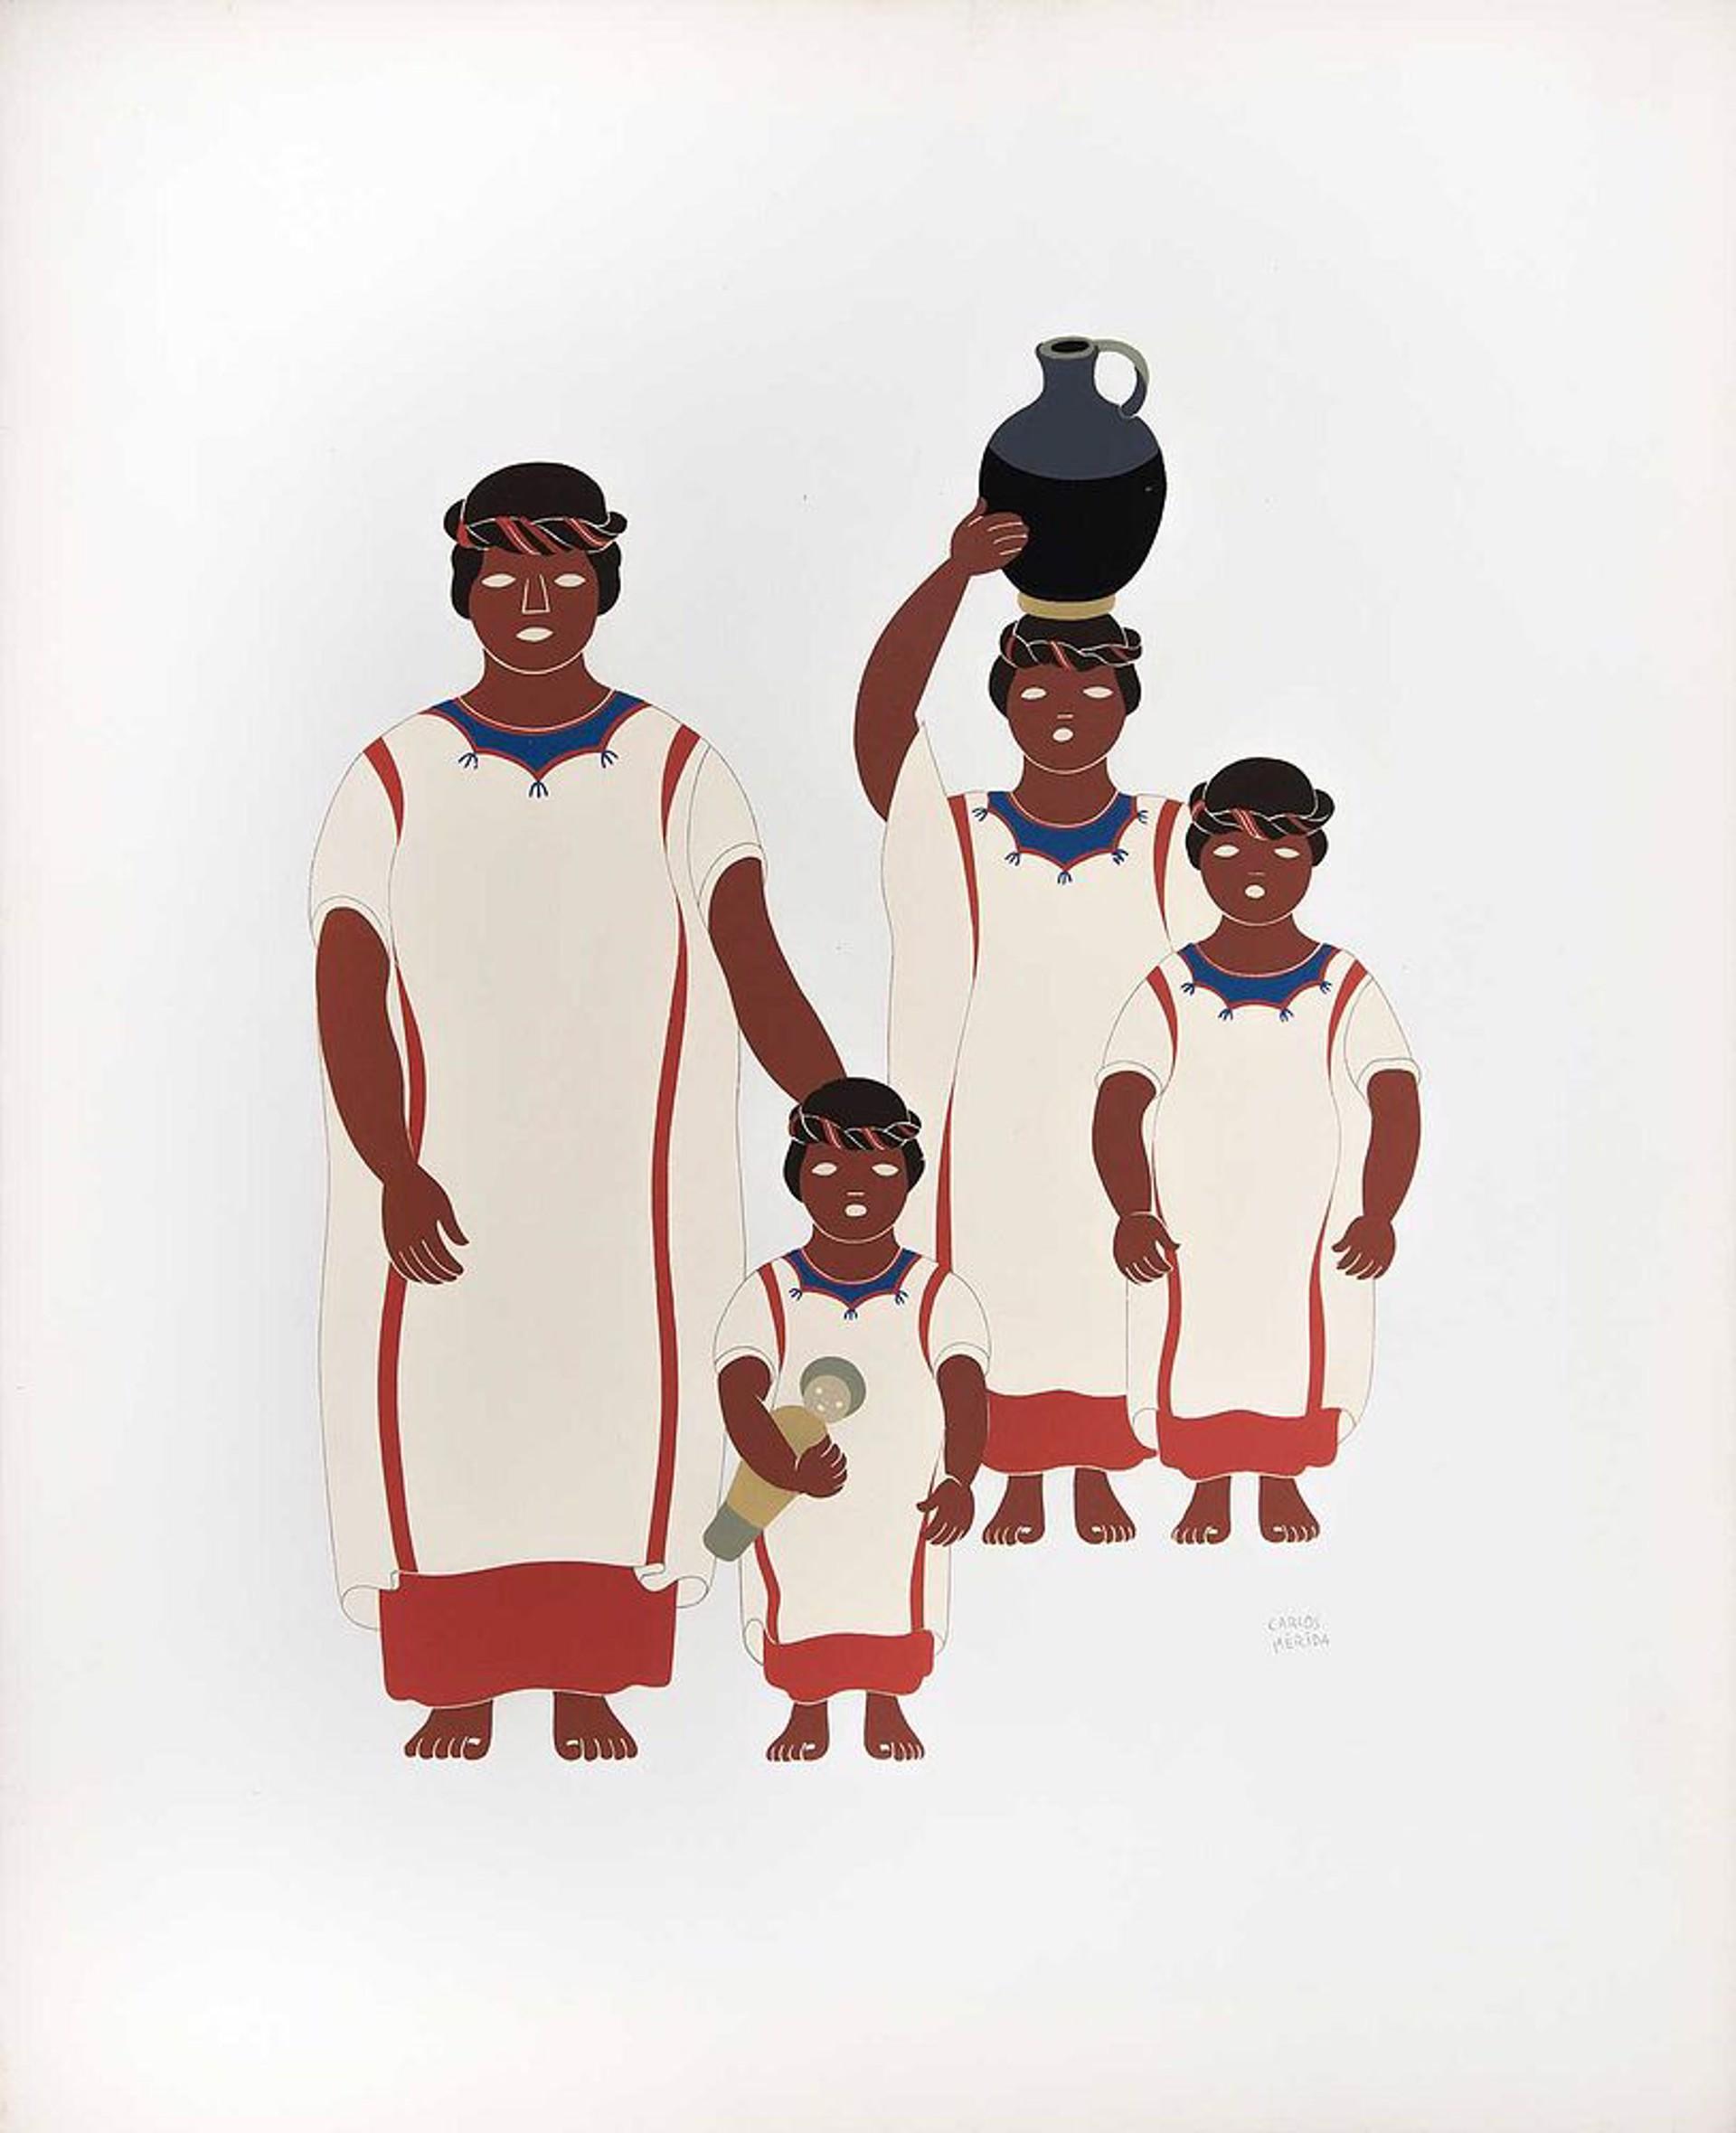 Ozumazins of the State of Oaxaca by Carlos Mérida (1891 - 1985)